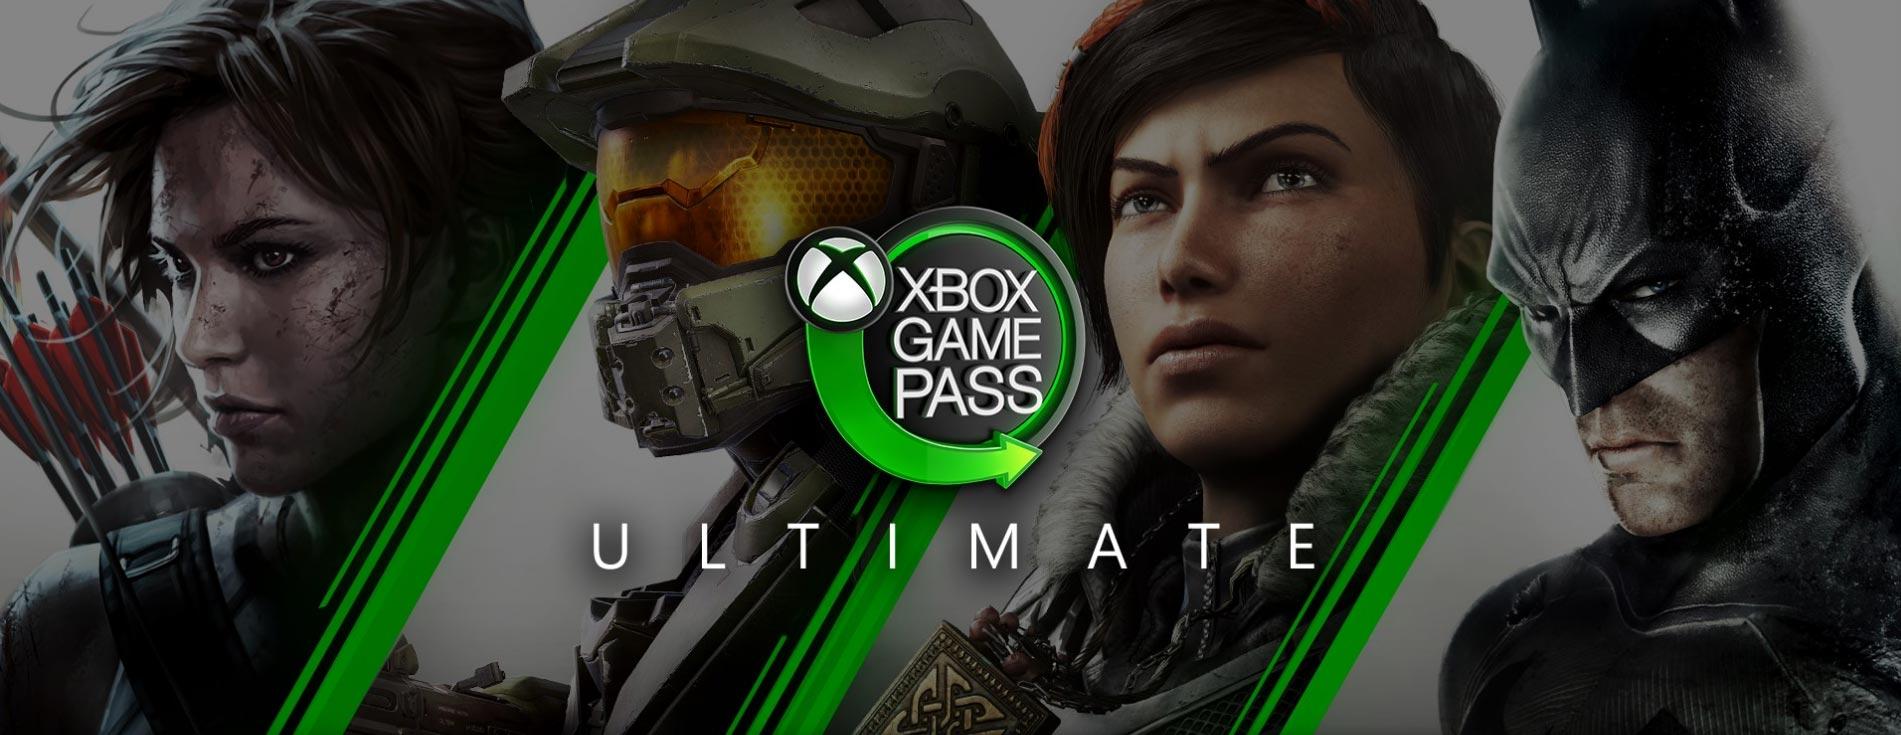 Coraz fajniejszy ten Xbox Game Pass - Children of Morta i Tekken 7 już dostępne 20